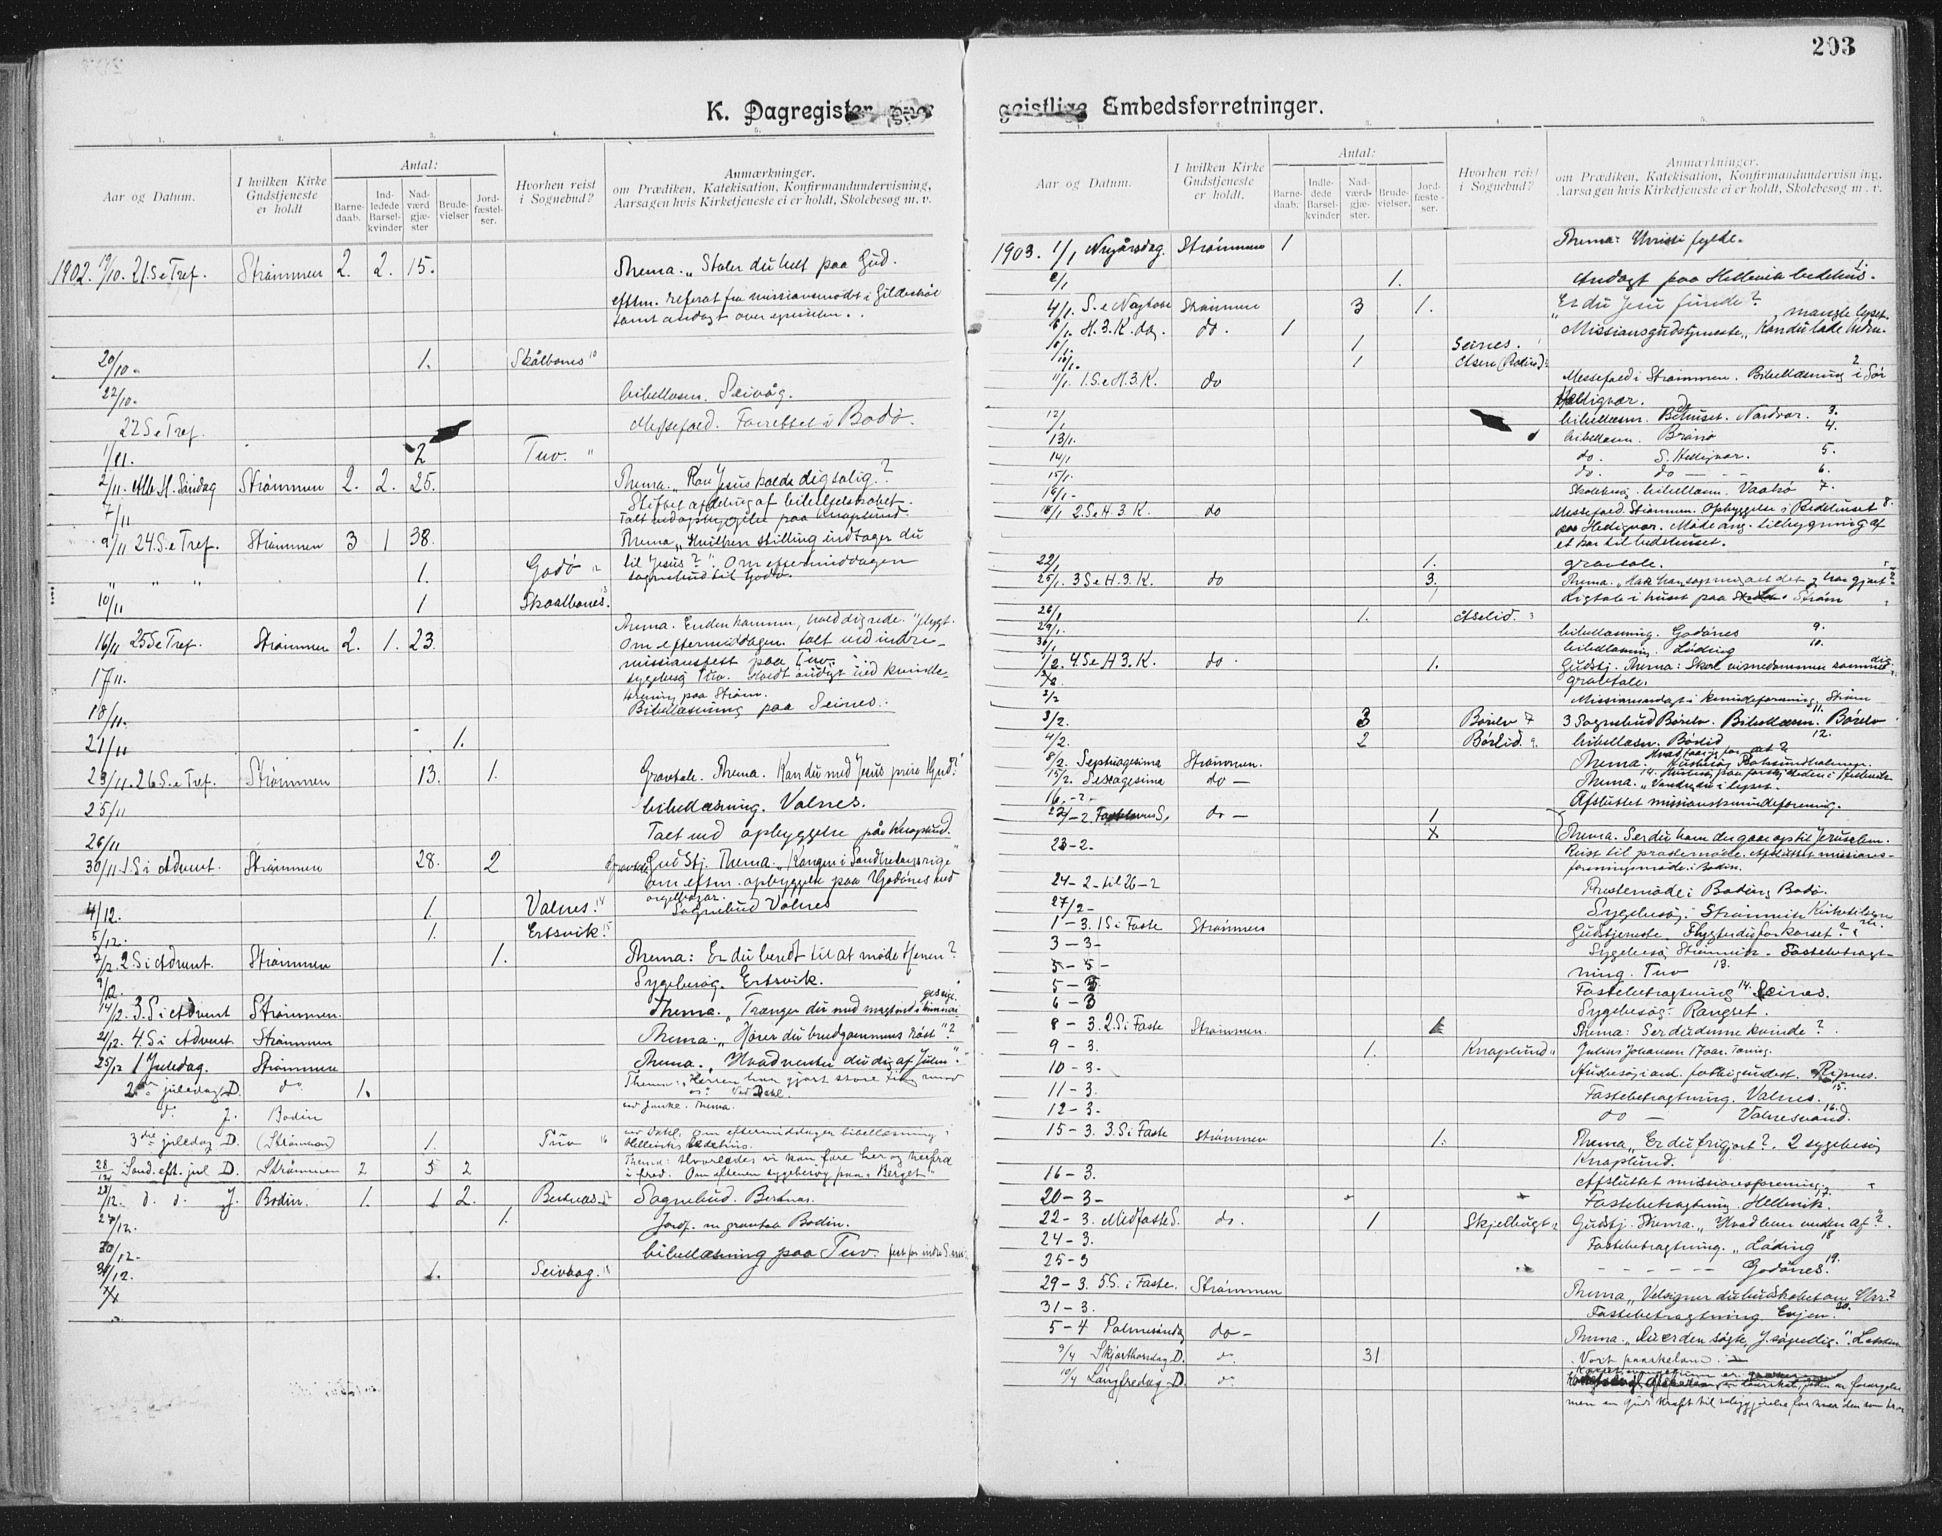 SAT, Ministerialprotokoller, klokkerbøker og fødselsregistre - Nordland, 804/L0081: Ministerialbok nr. 804A02, 1901-1915, s. 293